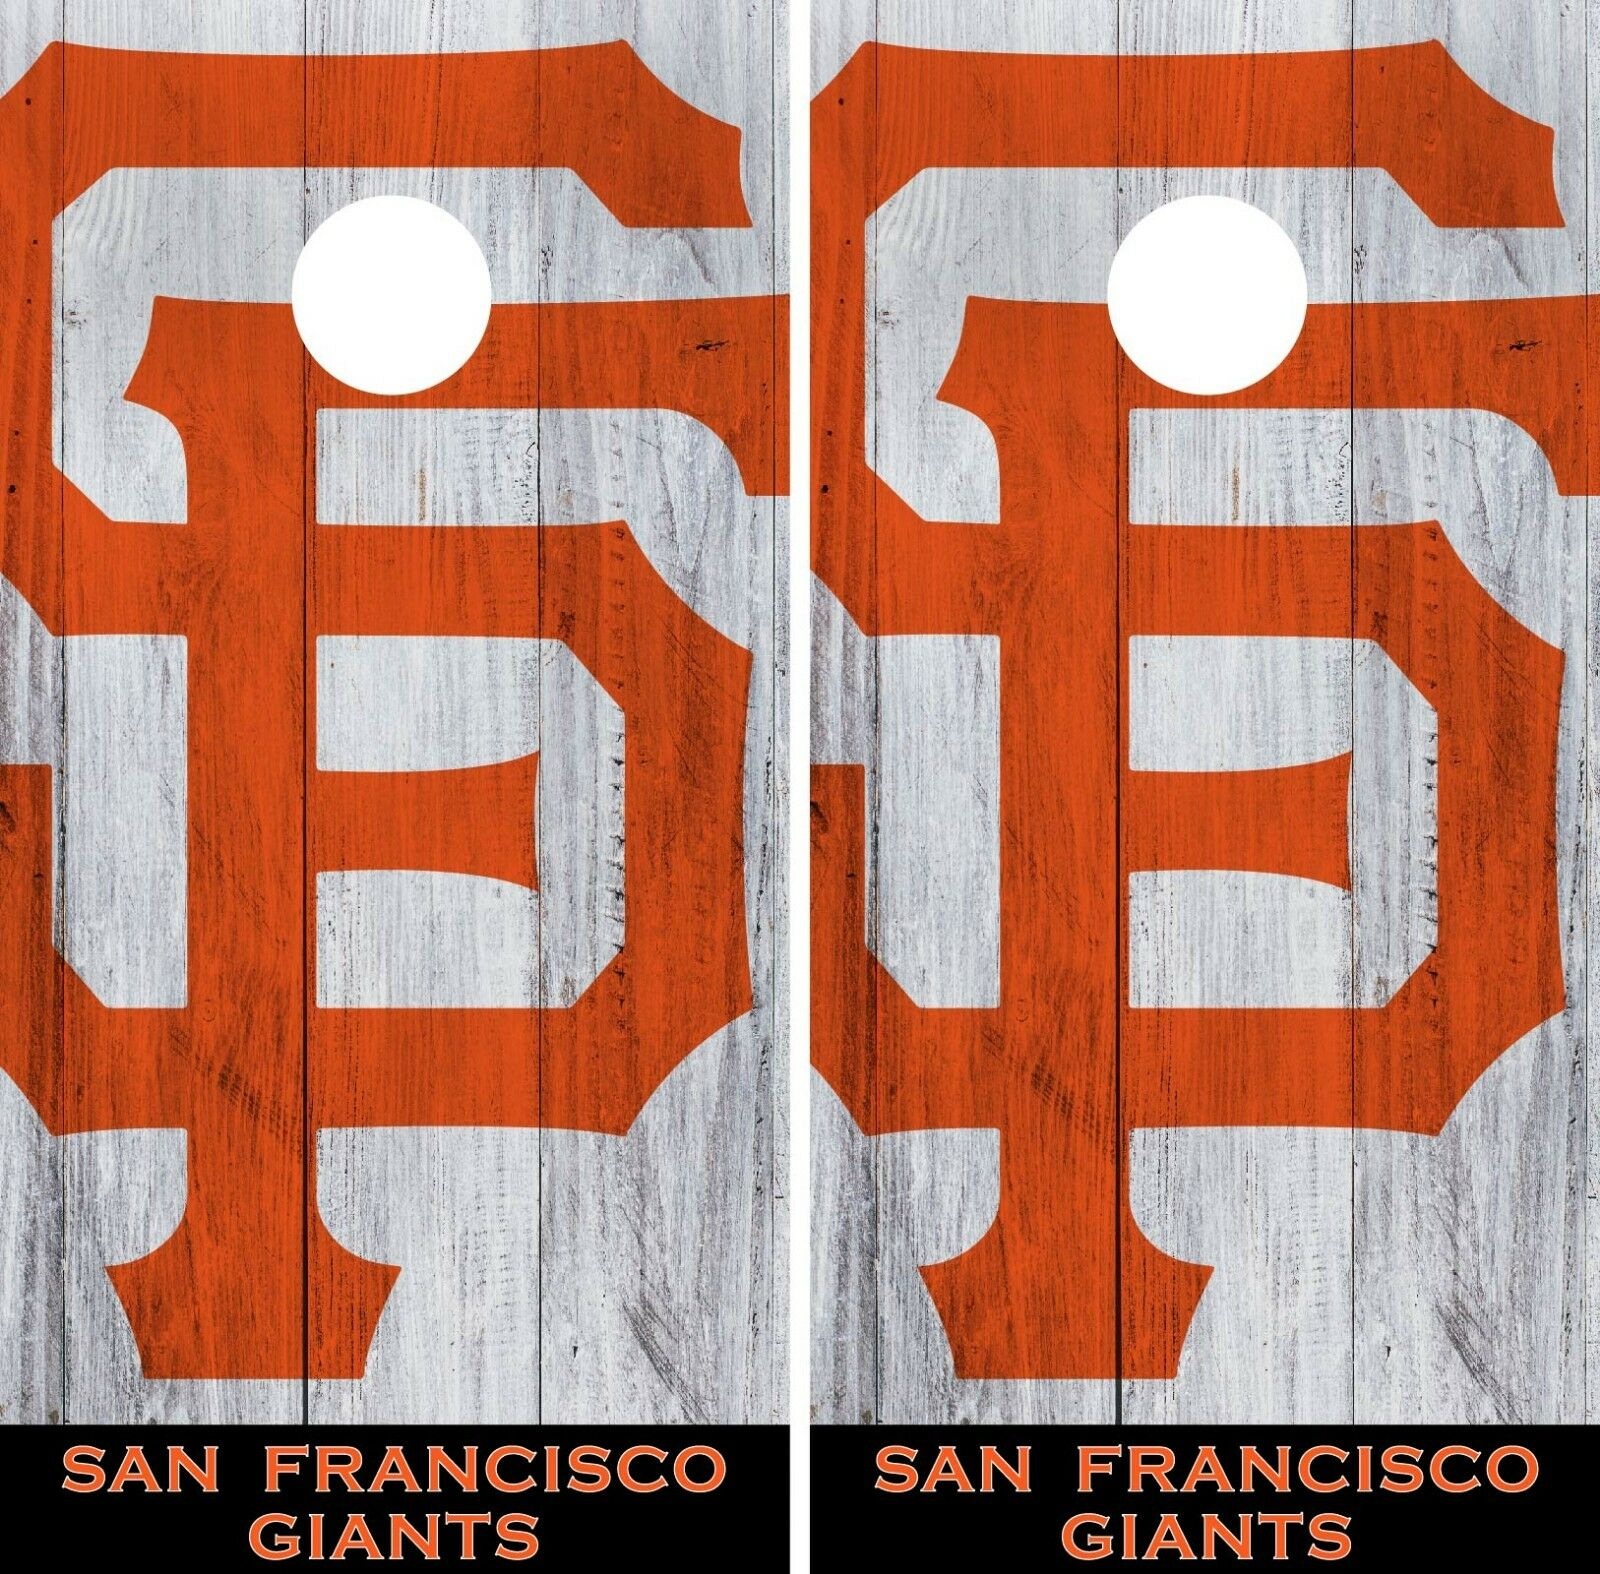 San Francisco Giant Cornhole Wrap MLB Logo Game Board Skin Set Vinyl Decal CO532